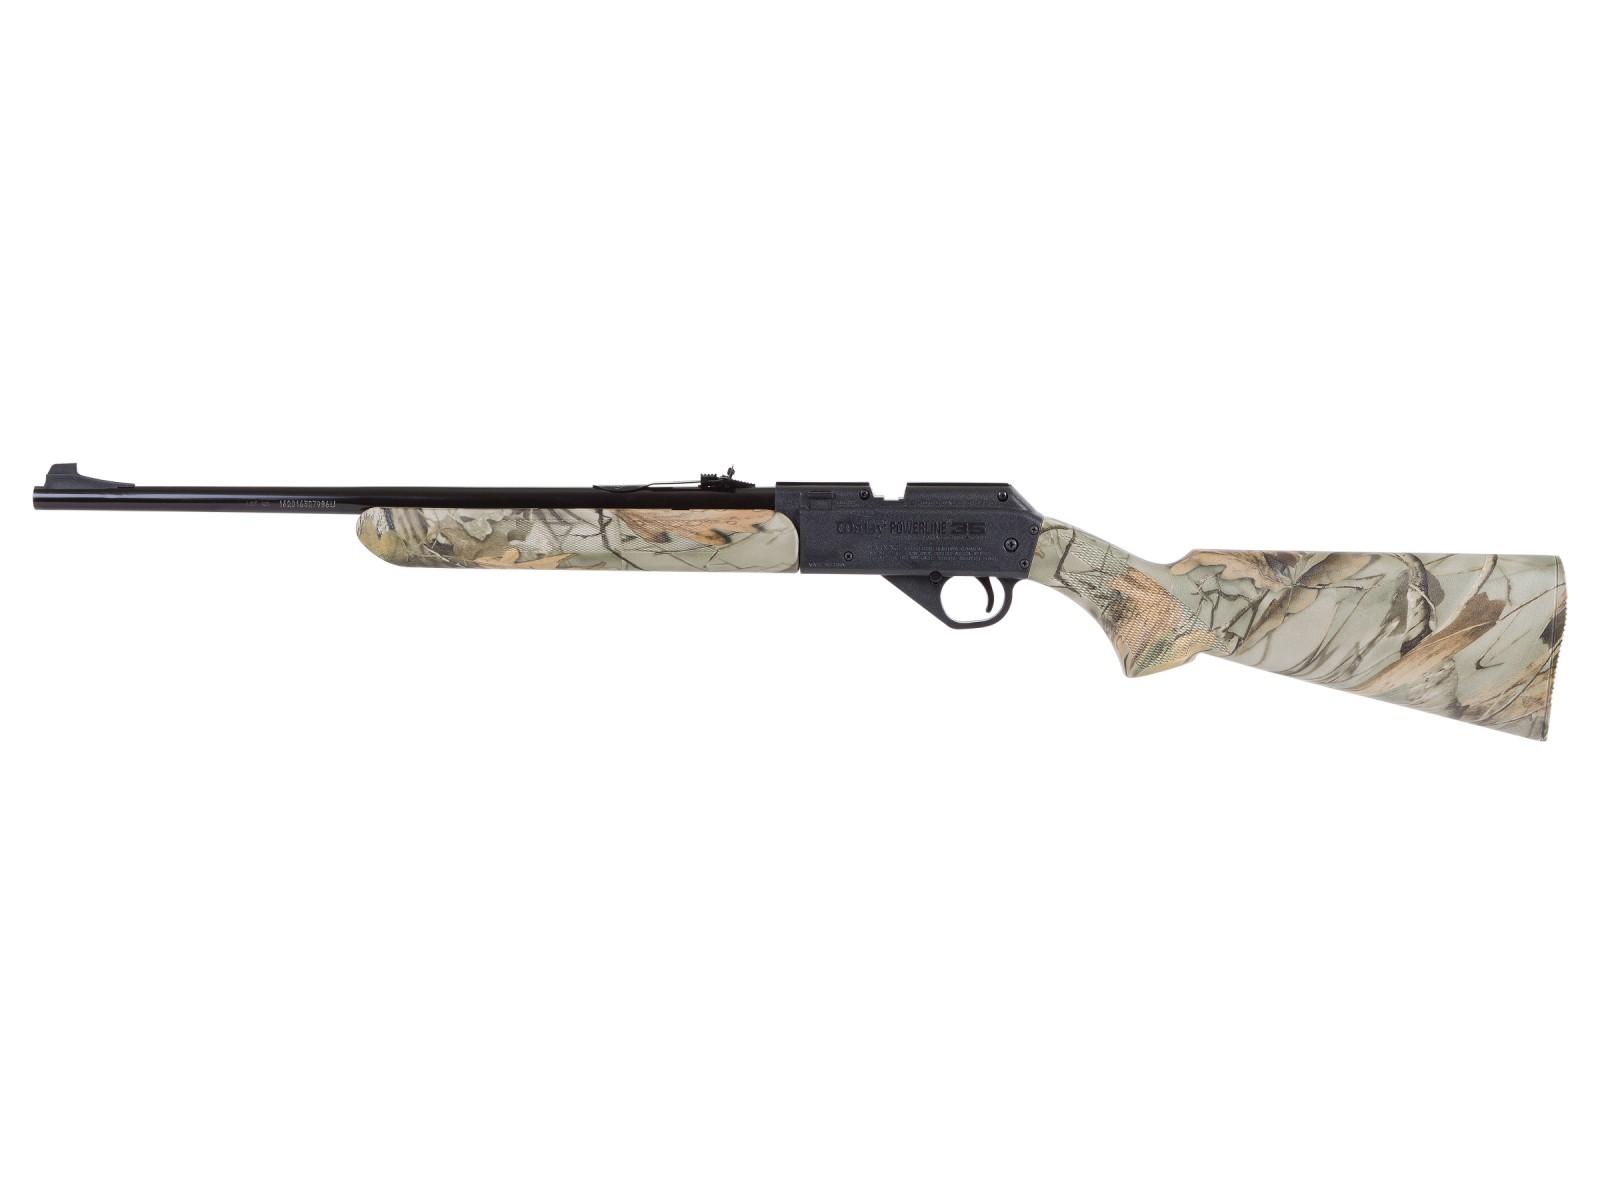 Daisy Powerline Model 35 Air Rifle, Camo